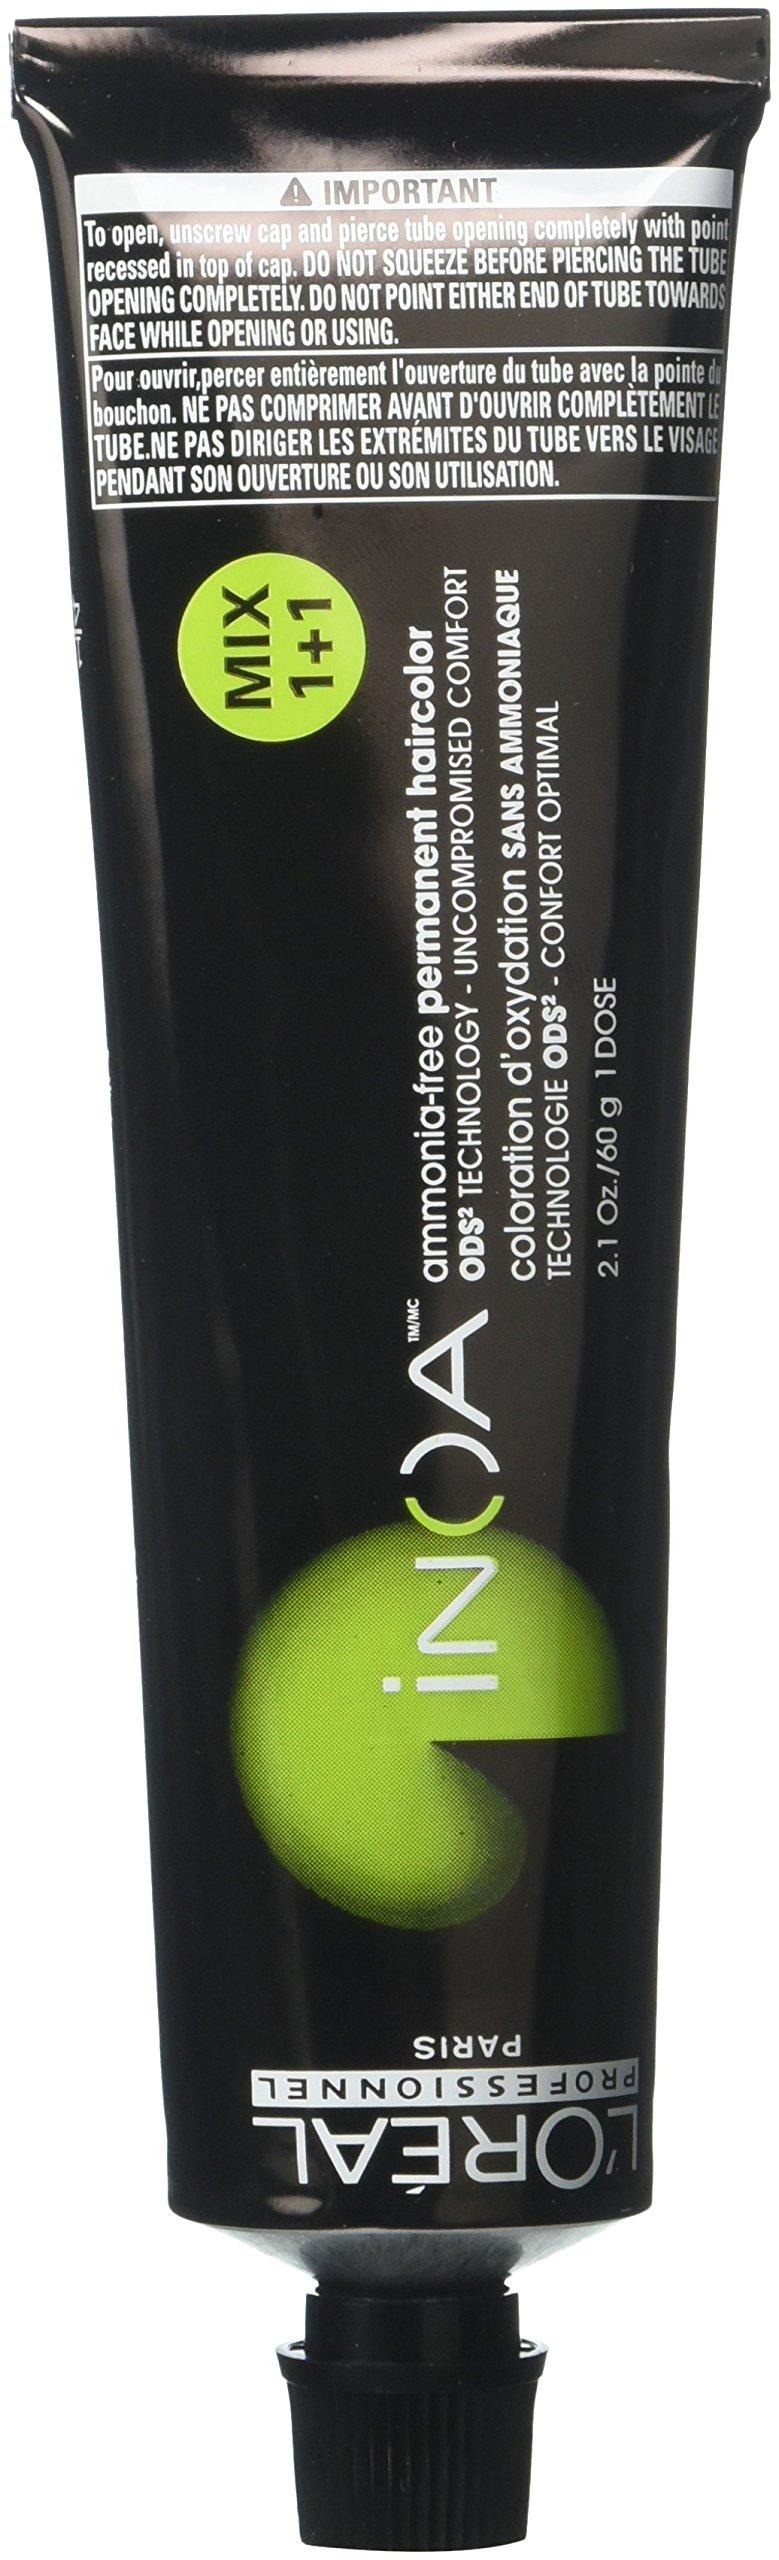 Best Of Inoa Ammonia Free Hair Color